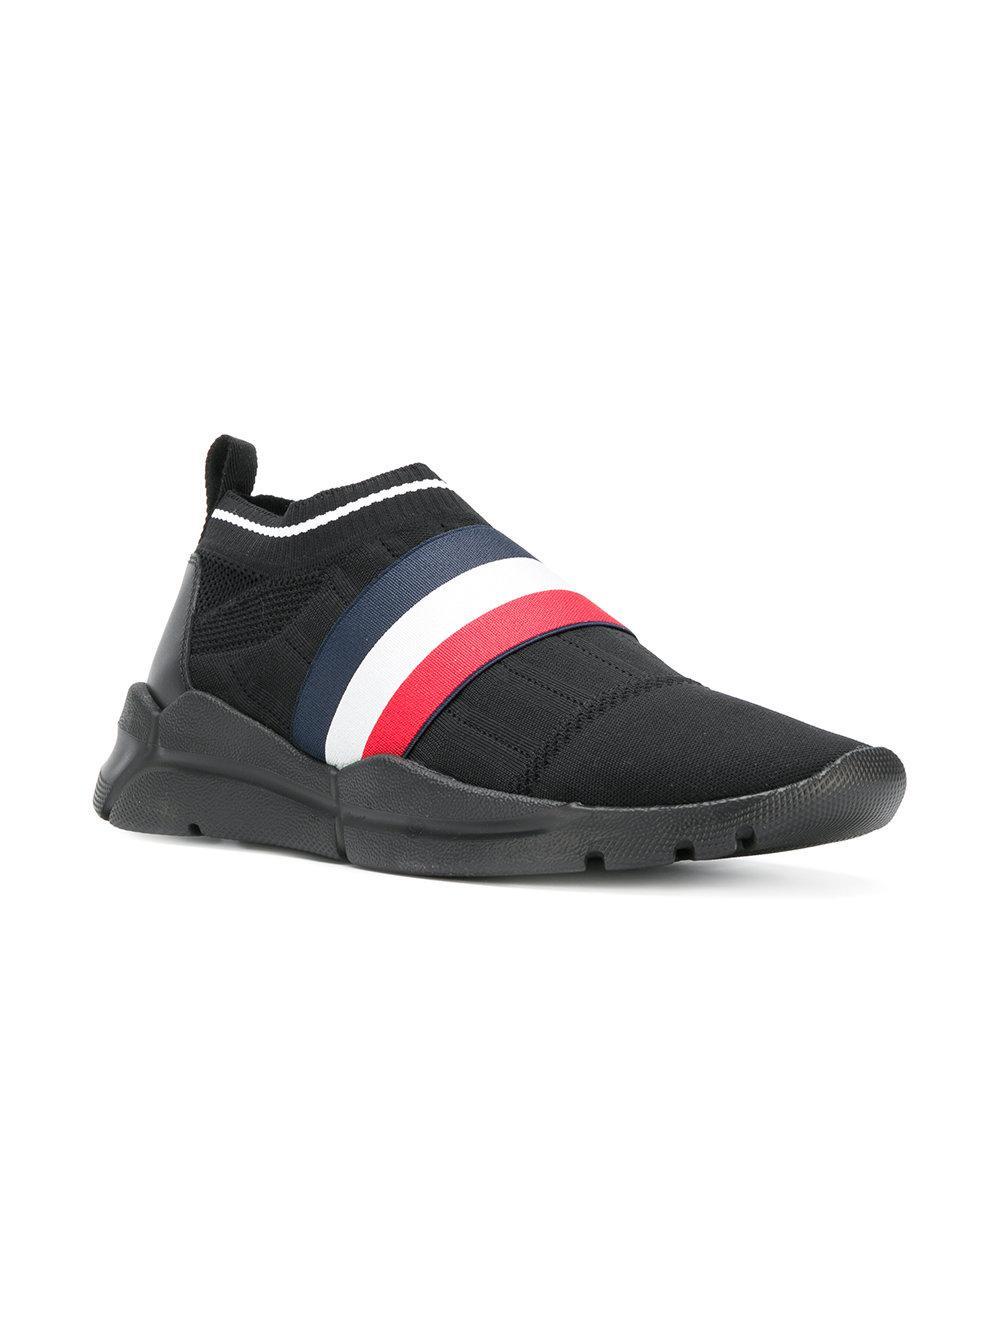 d3fe12df7 Moncler Adon Scarpa Sneakers in Black for Men - Lyst